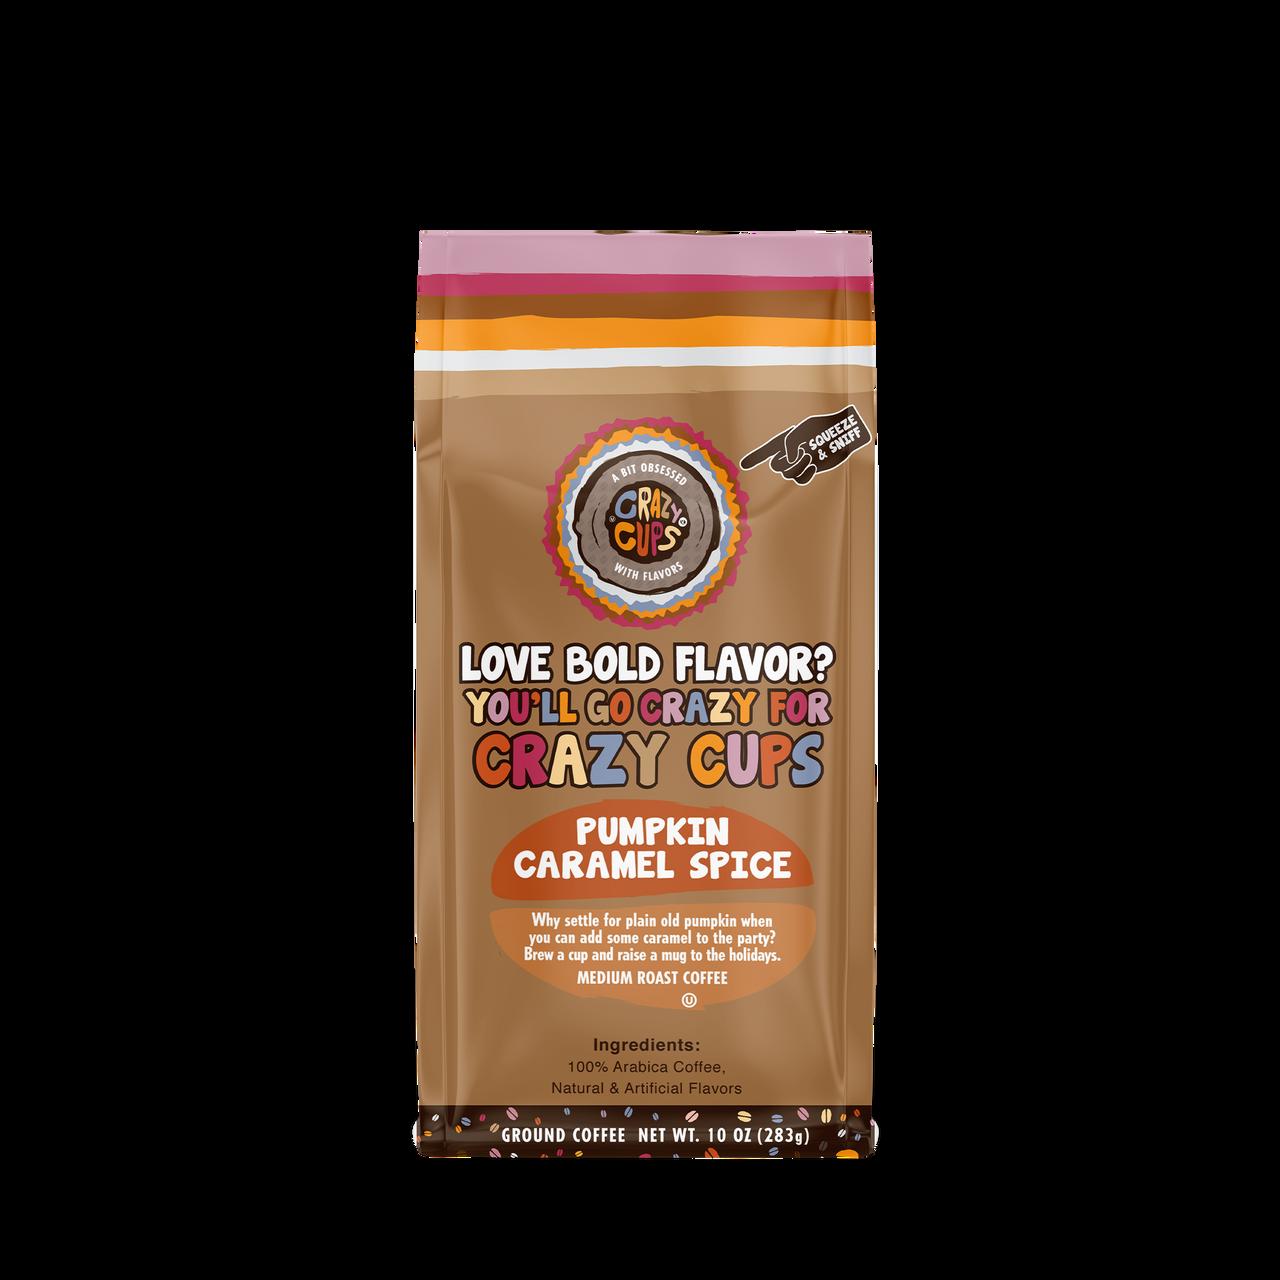 Pumpkin Caramel Spice Ground Coffee By Crazy Cups